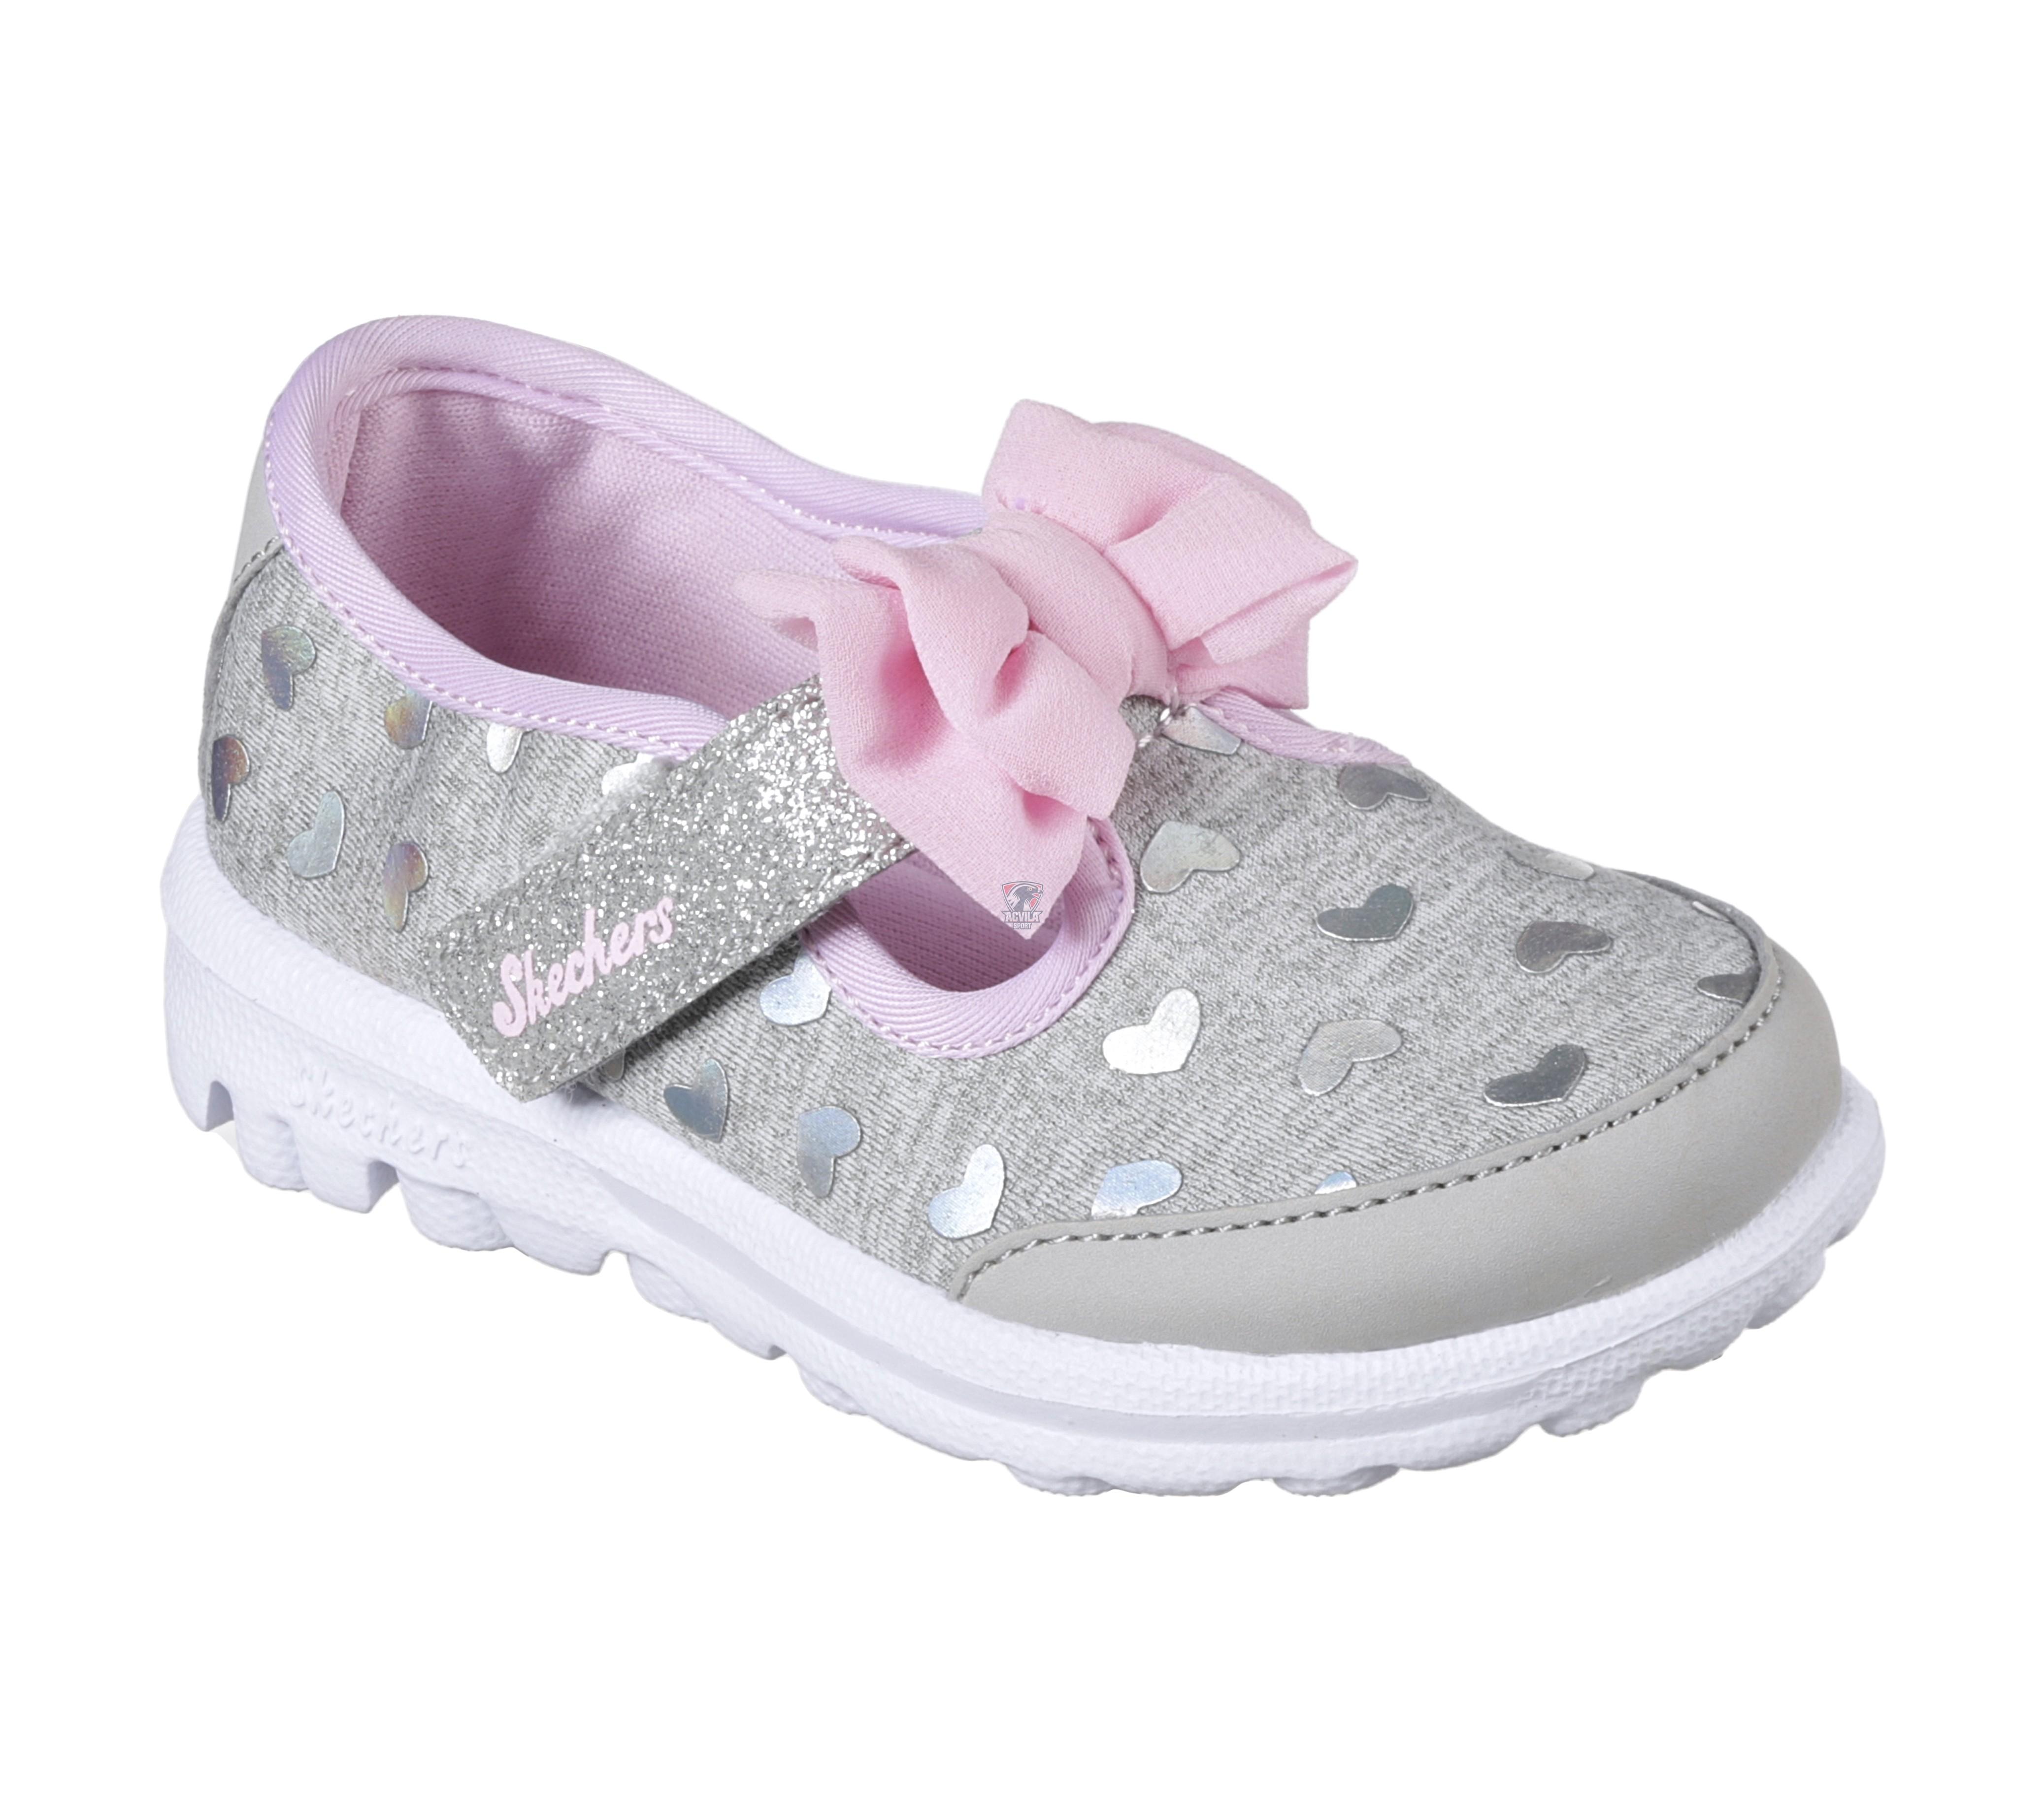 photo 0 Детская обувь SKECHERS DYNAMIGHT - LEAD RUNNER